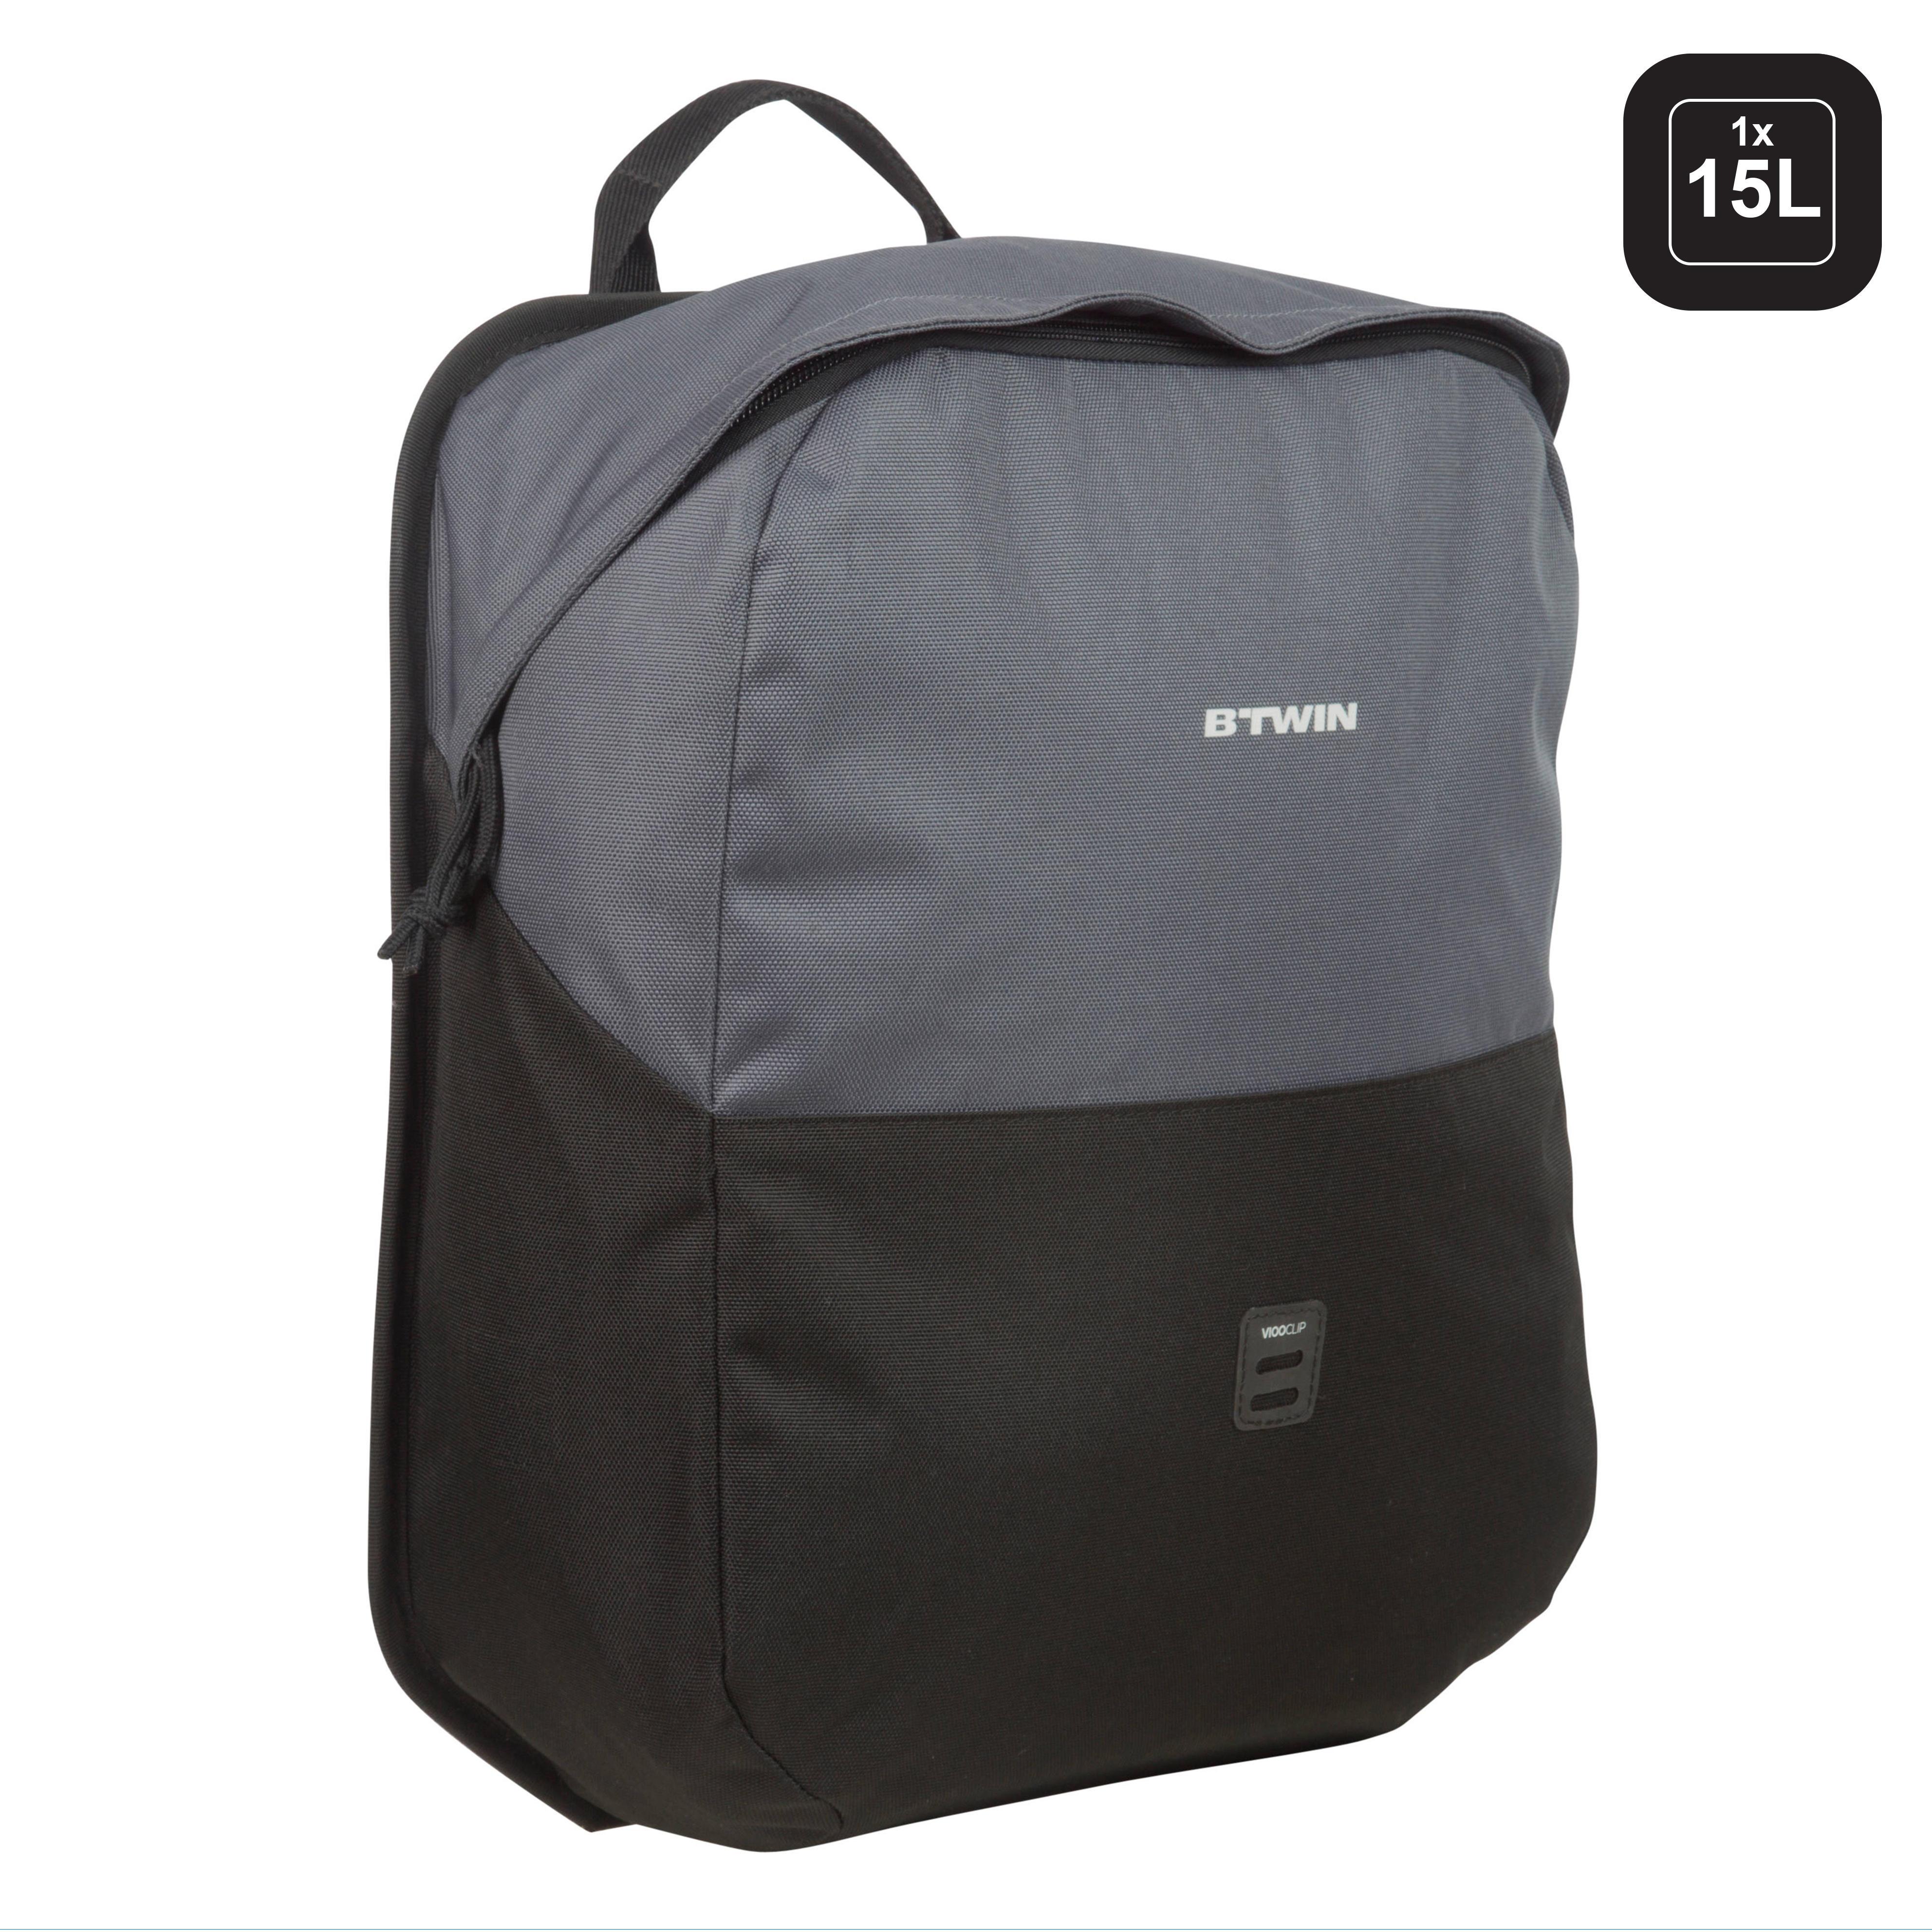 b 39 twin sacoche velo 100 sur porte bagages 15 litres decathlon. Black Bedroom Furniture Sets. Home Design Ideas